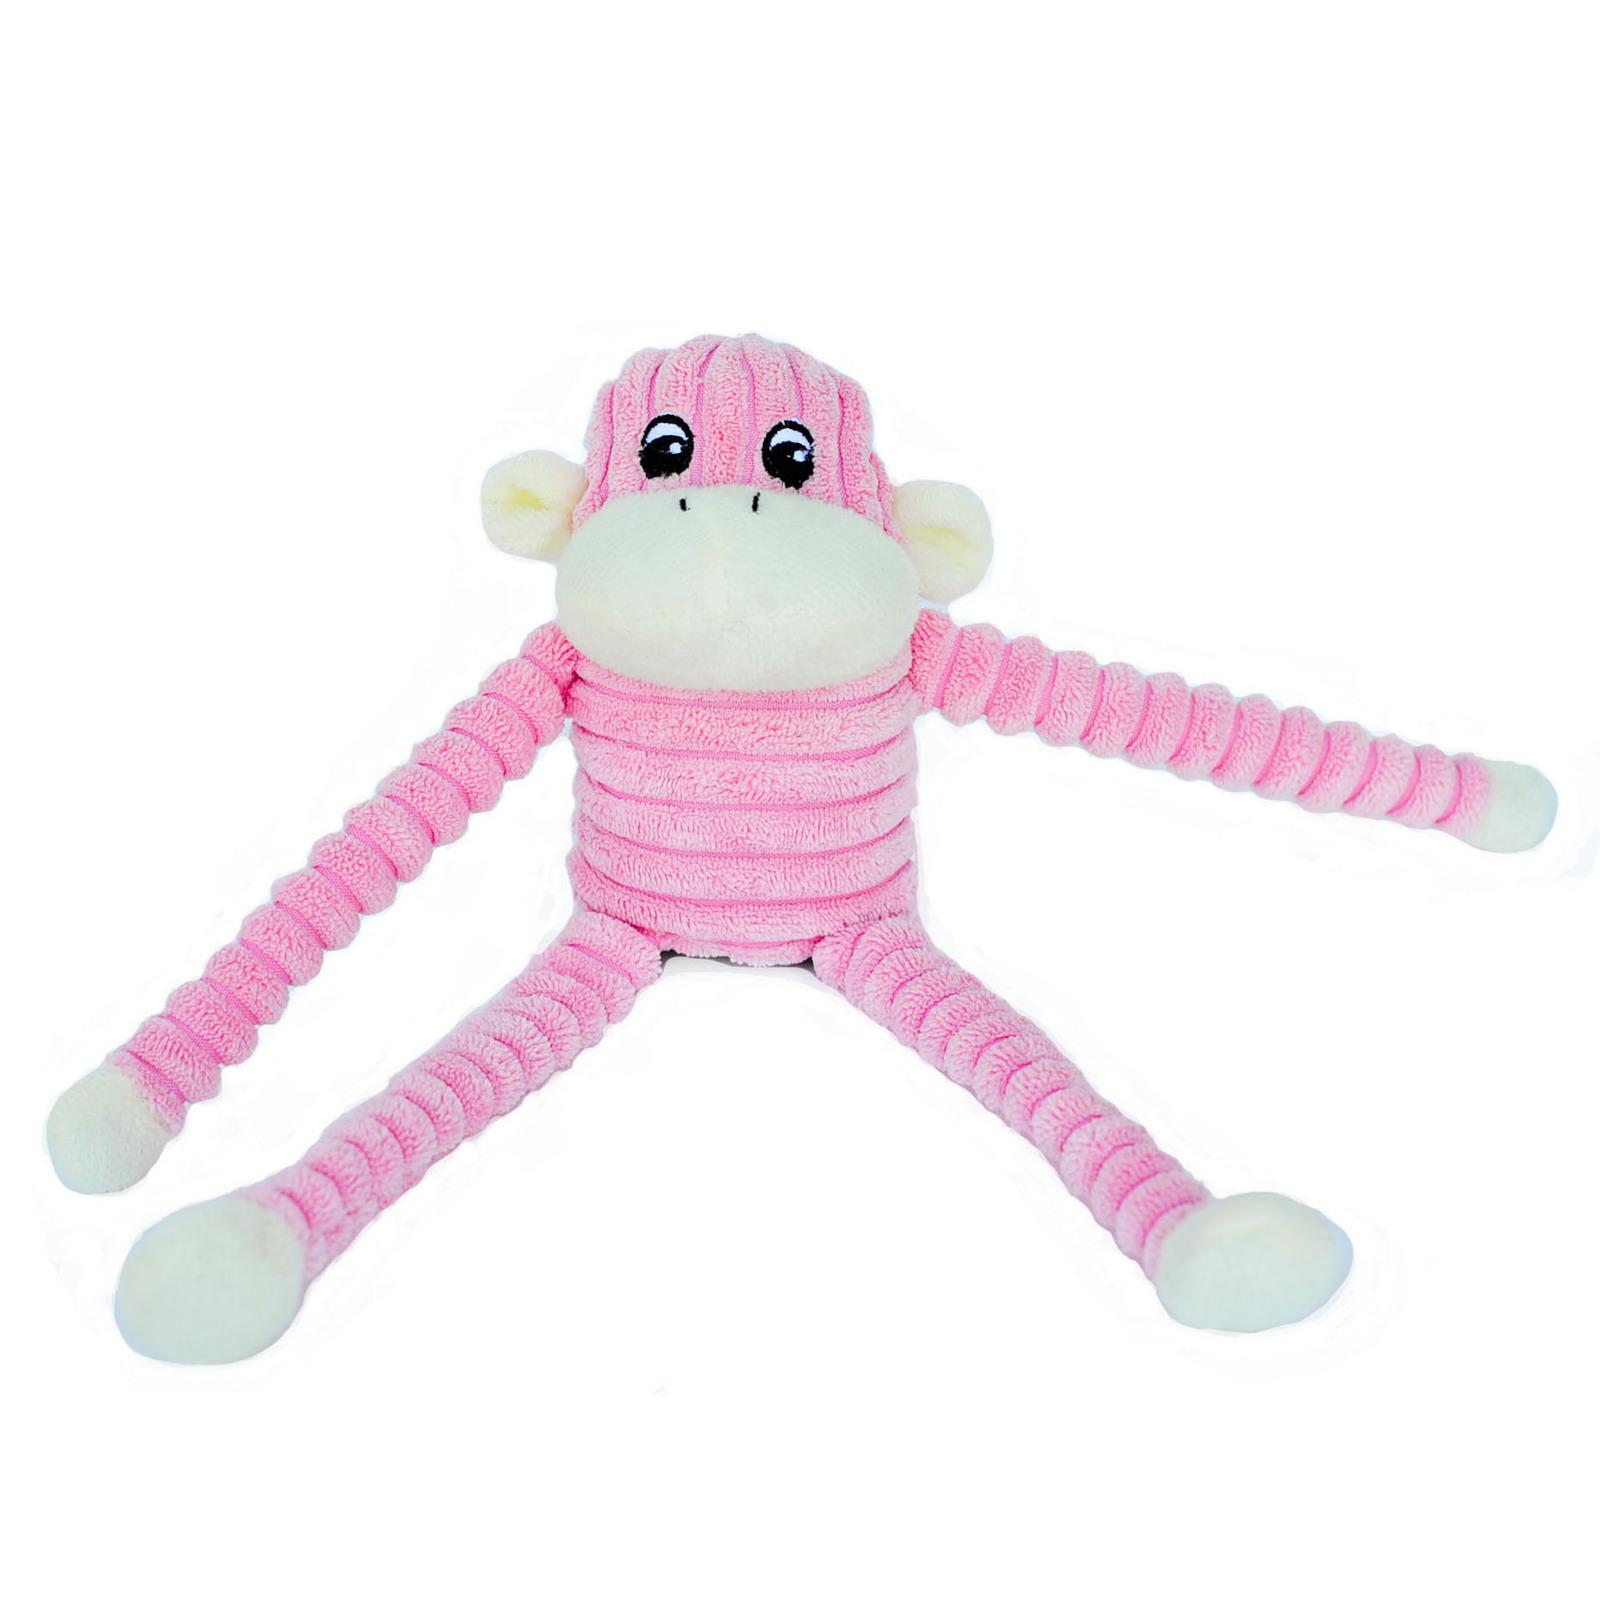 Pink Dog Toy : Zippy paws spencer the crinkle monkey squeaker dog toy